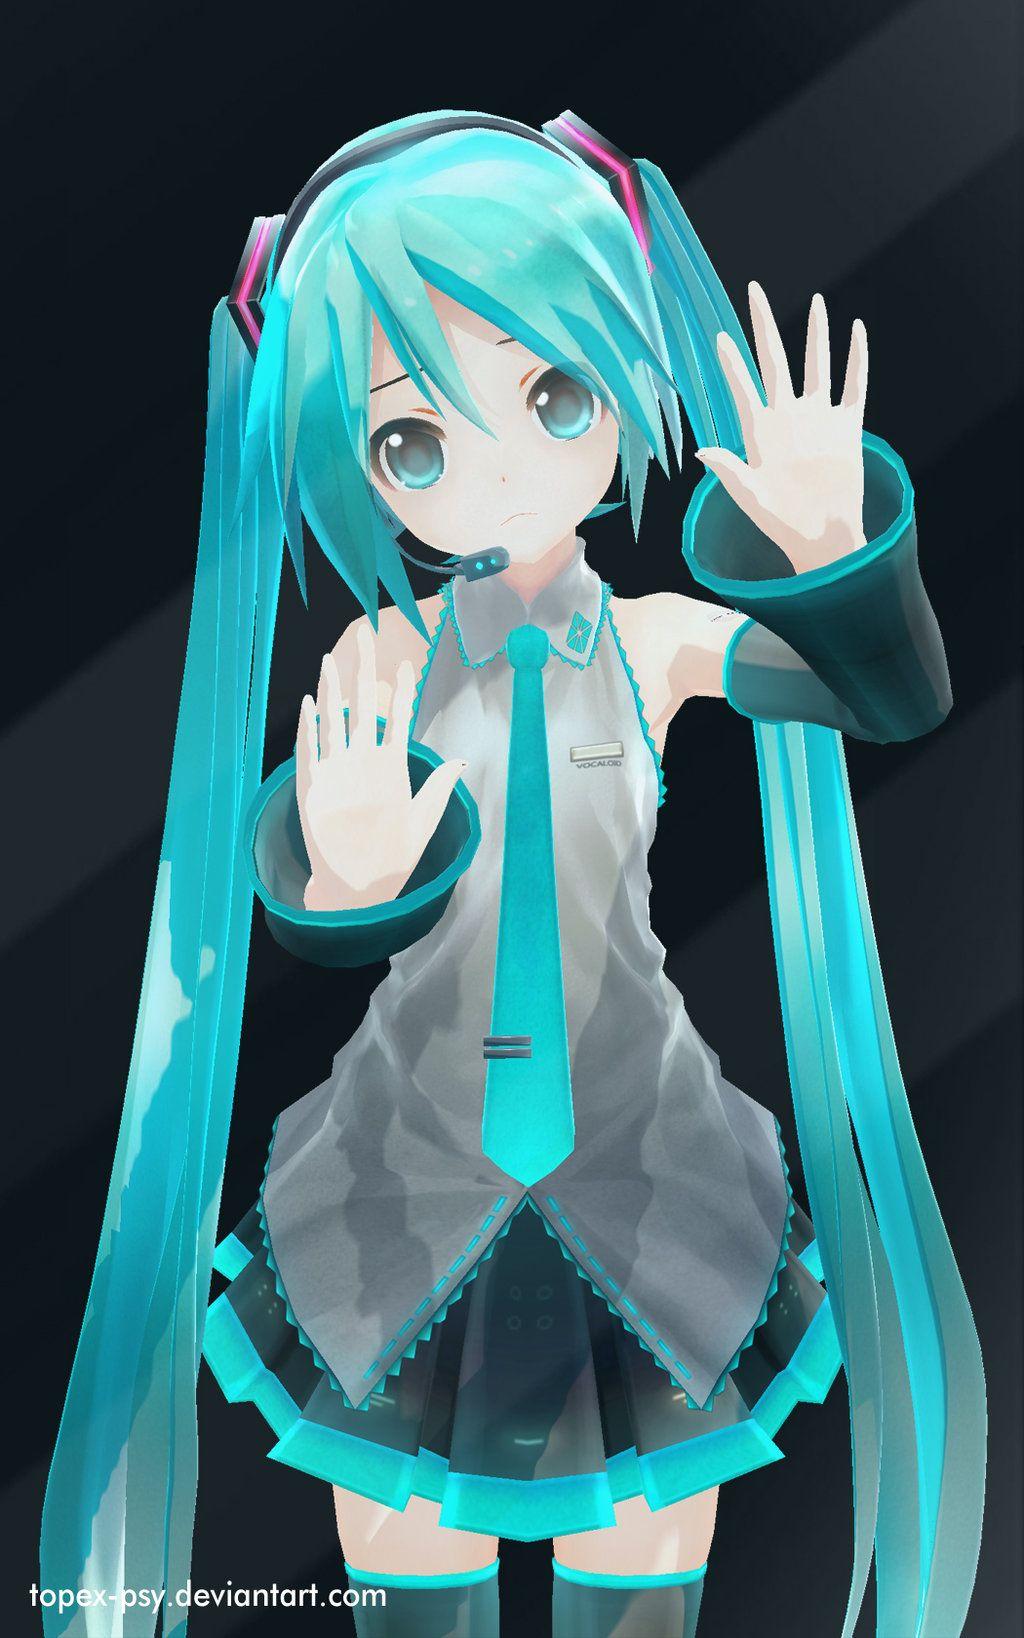 Hatsune Miku Android Wallpaper In 2020 Hatsune Miku Hatsune Miku Hatsune Vocaloid